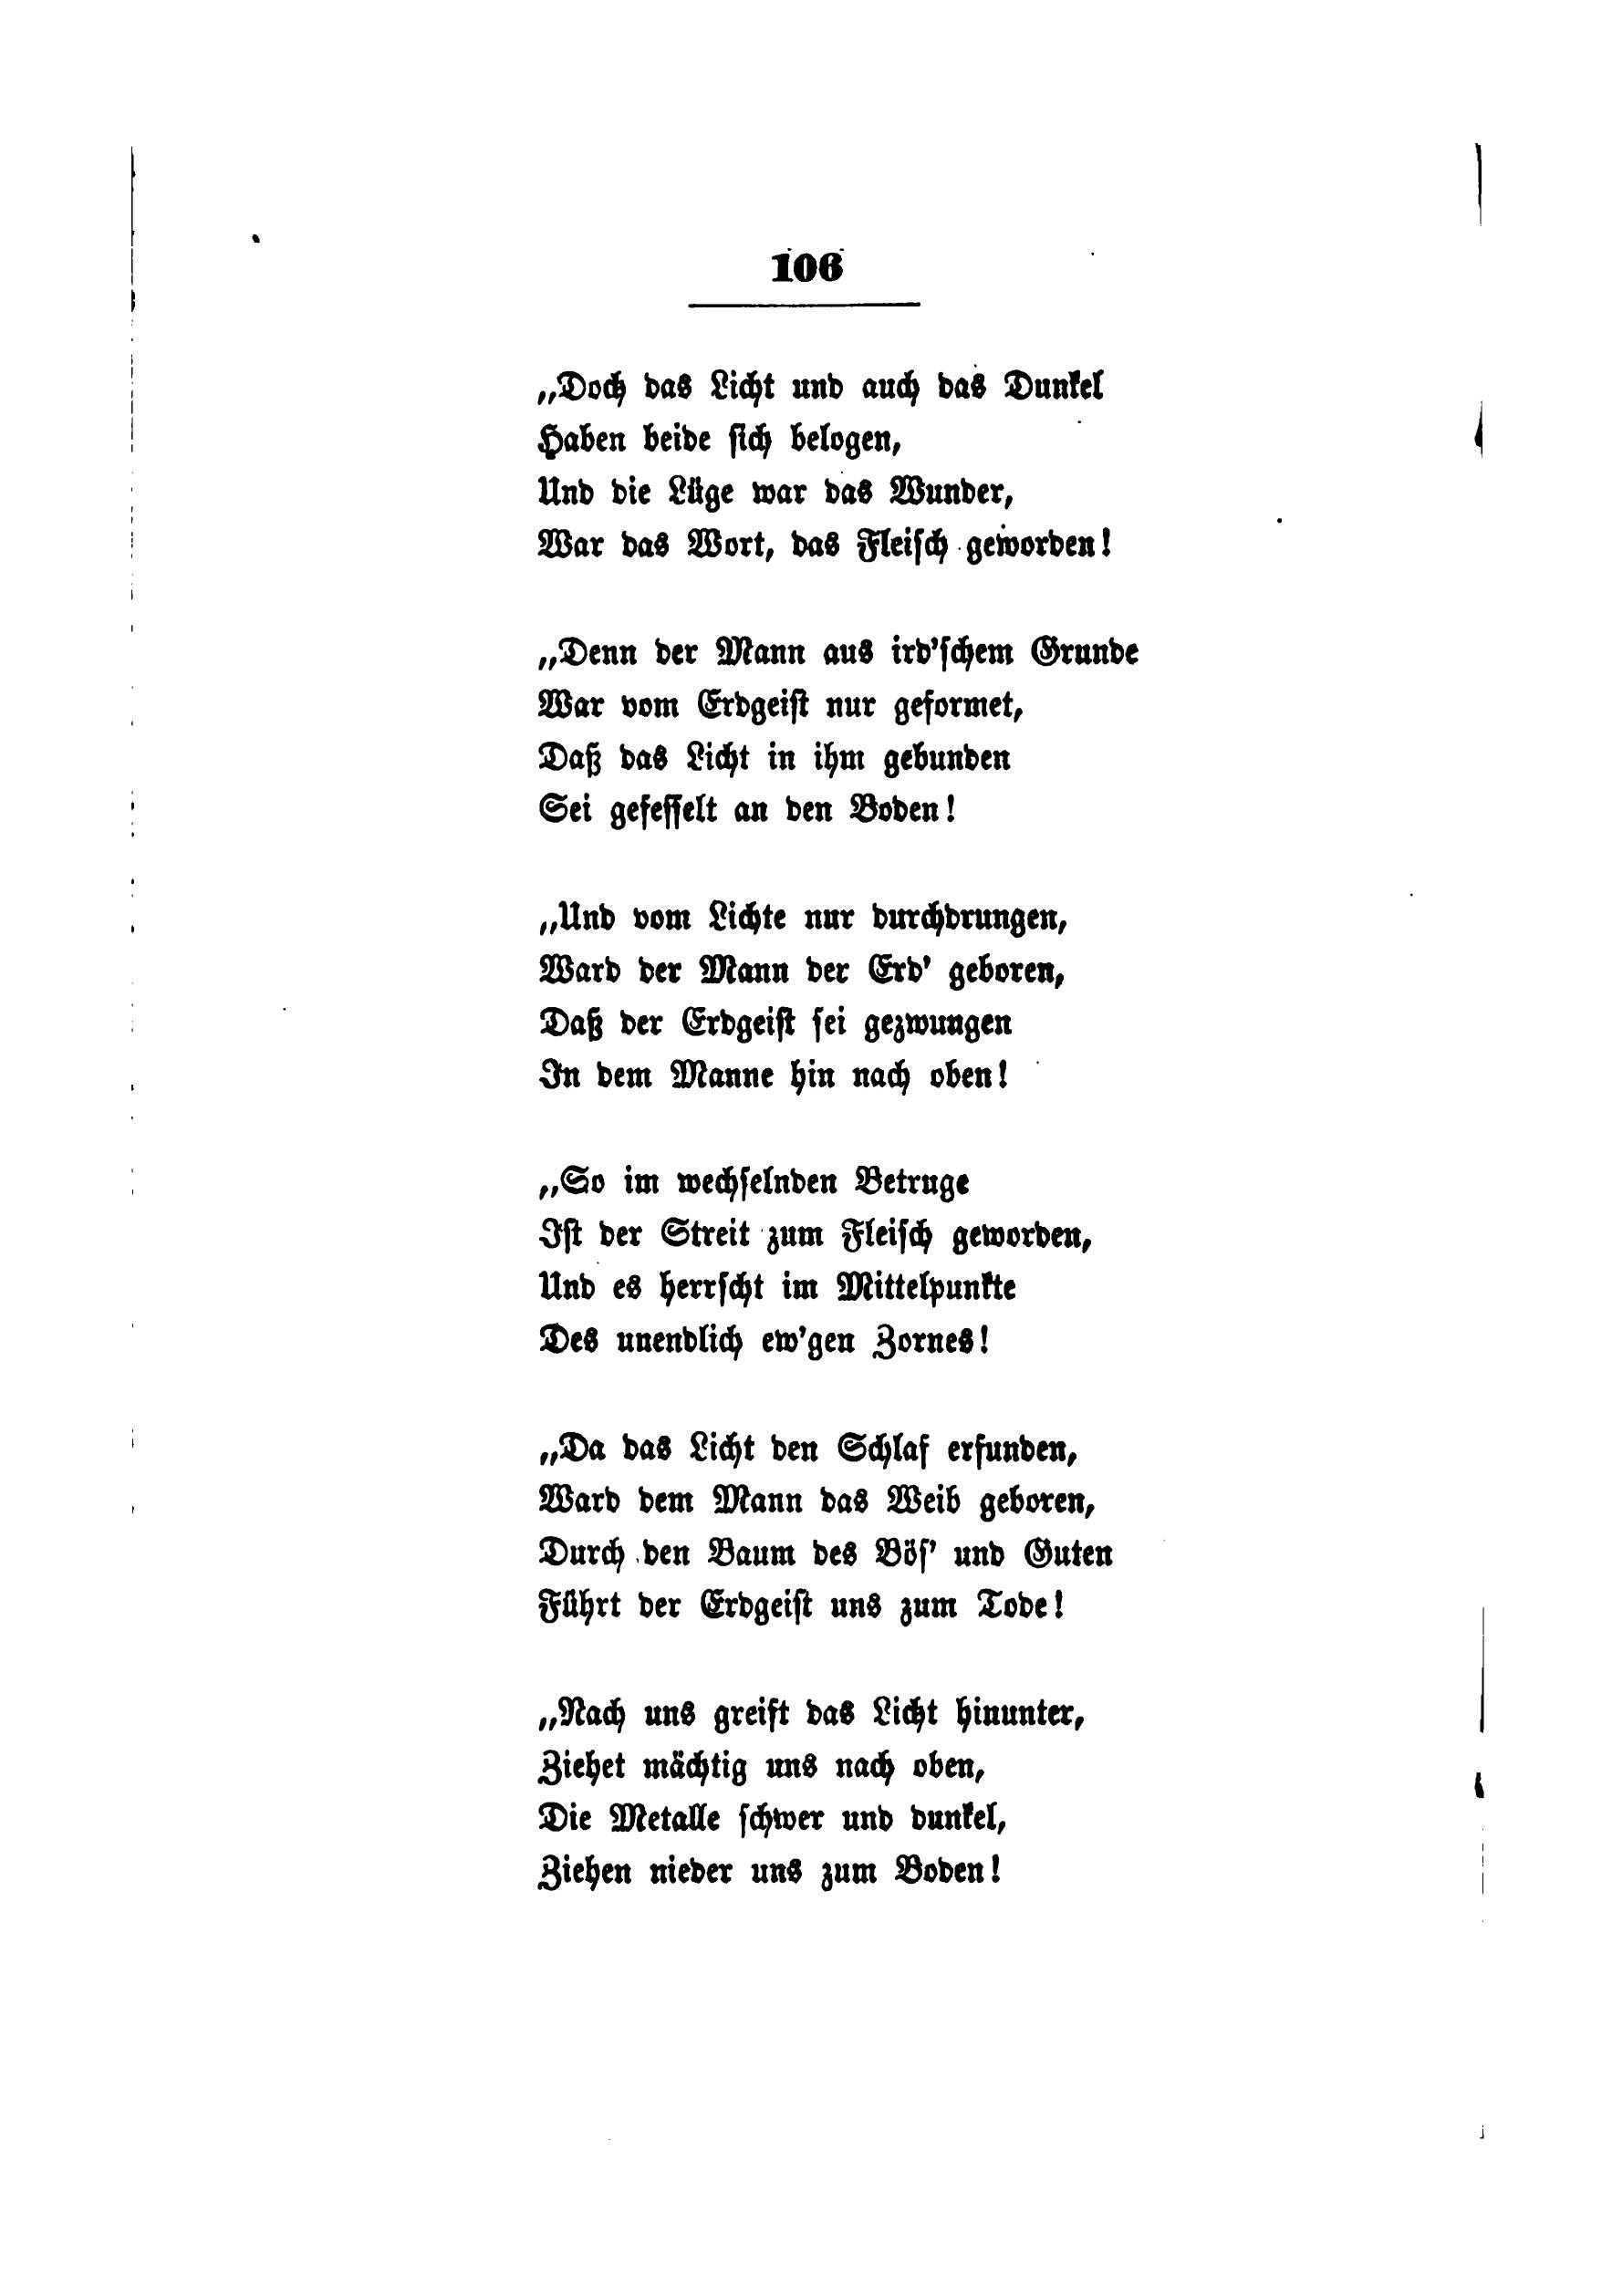 File Clemens Brentano S Gesammelte Schriften III 106 Wikimedia